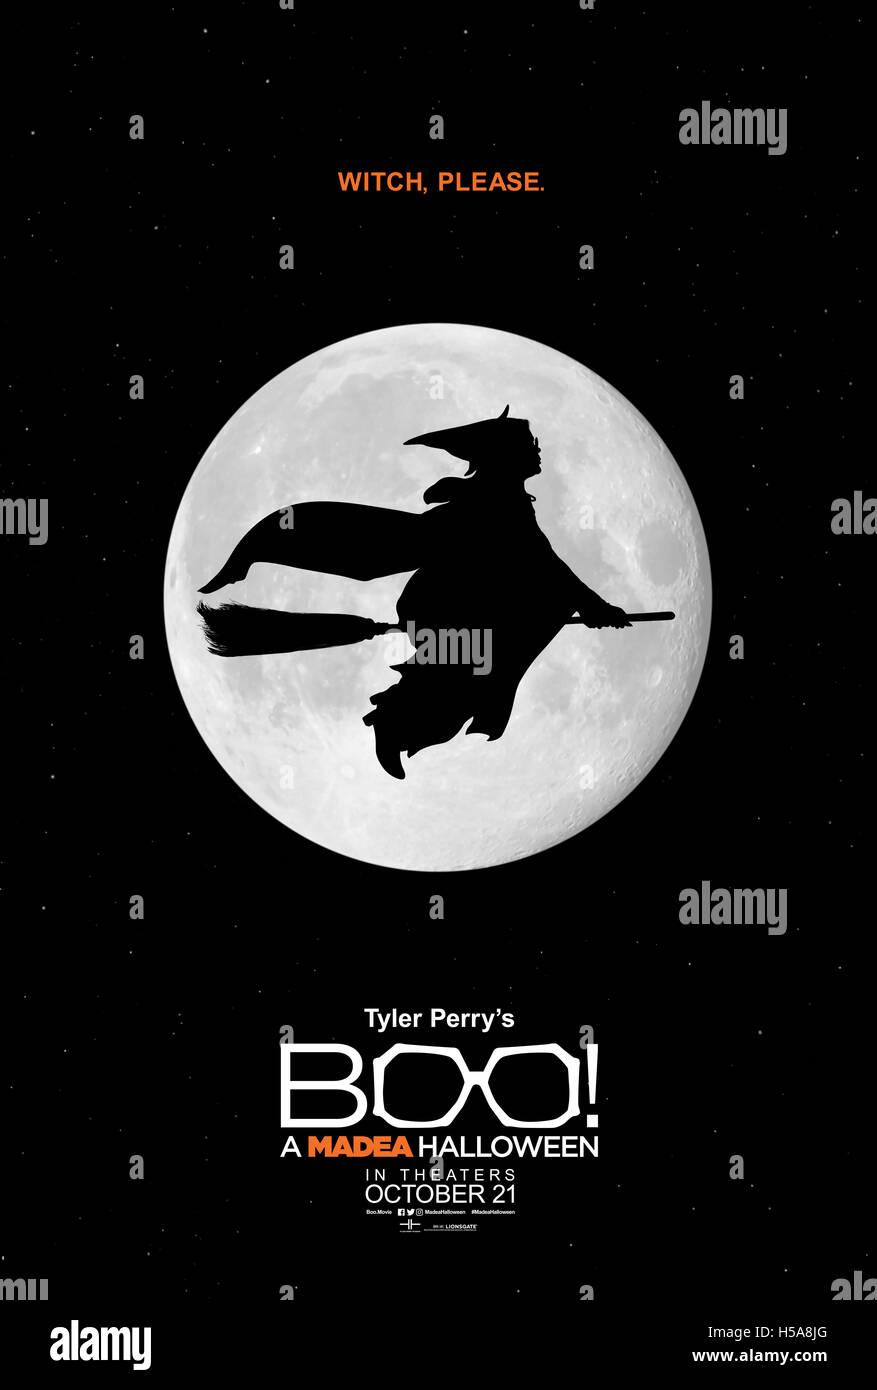 RELEASE DATE: October 21, 2016 TITLE: Boo! A Madea Halloween ...